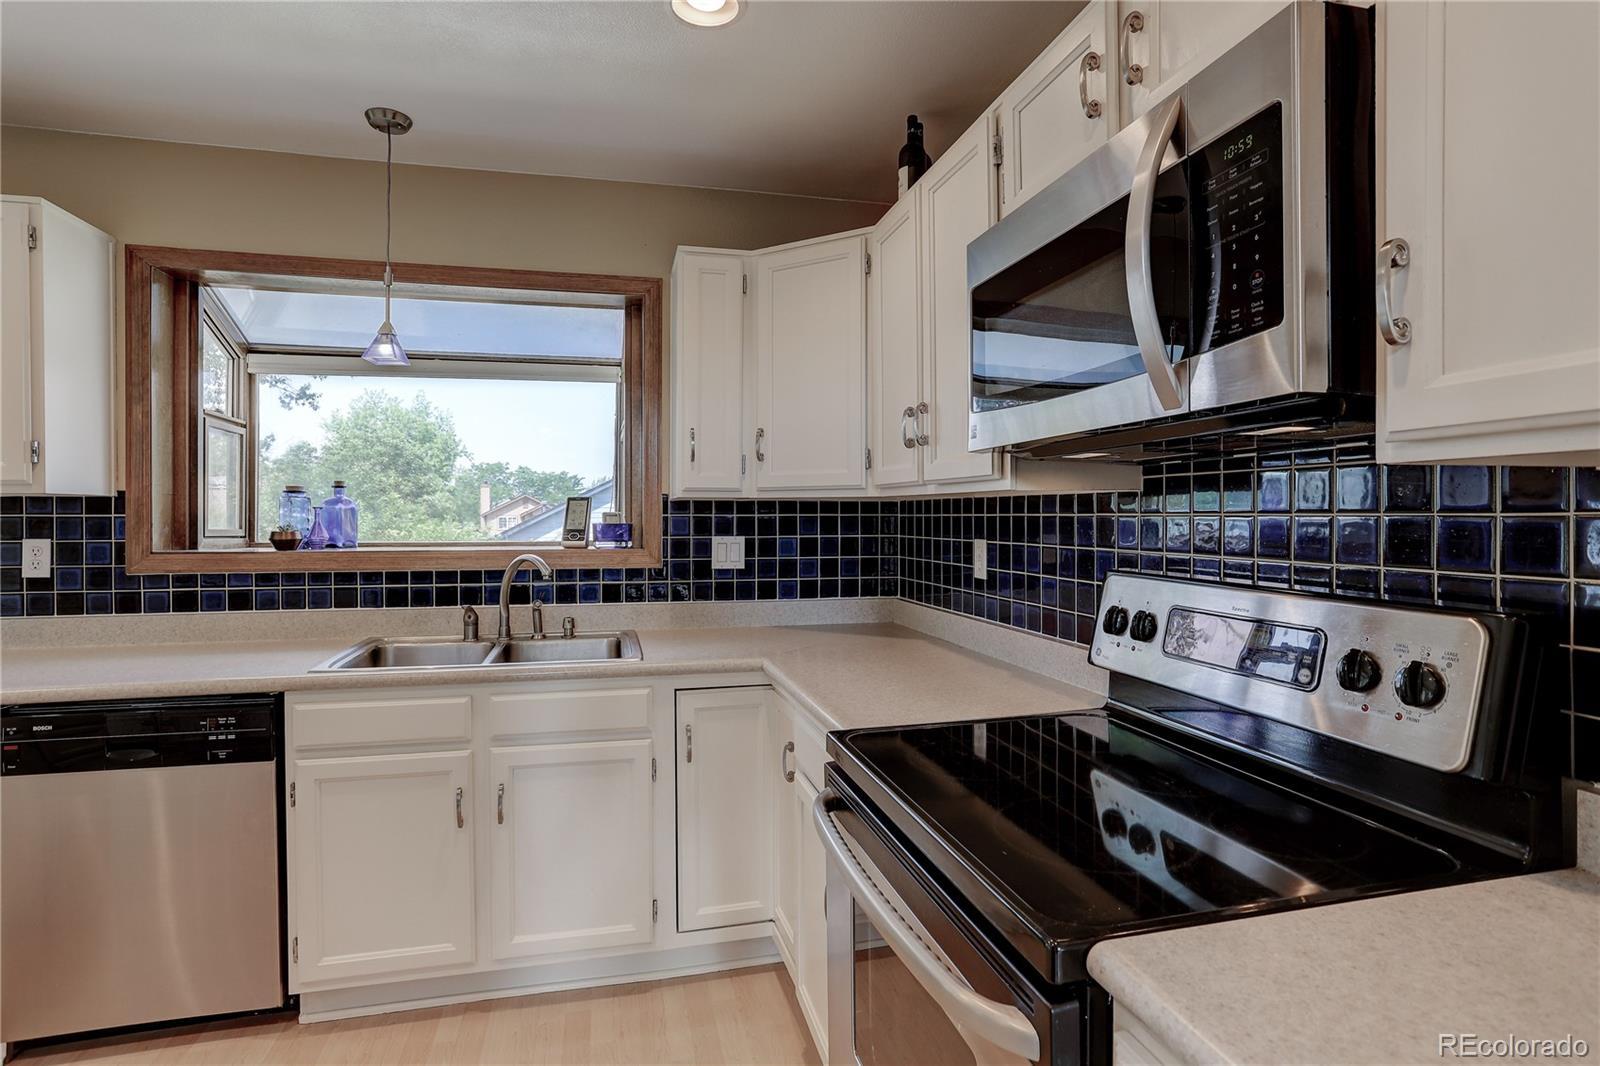 MLS# 9389187 - 10 - 1245 Goldsmith Drive, Highlands Ranch, CO 80126